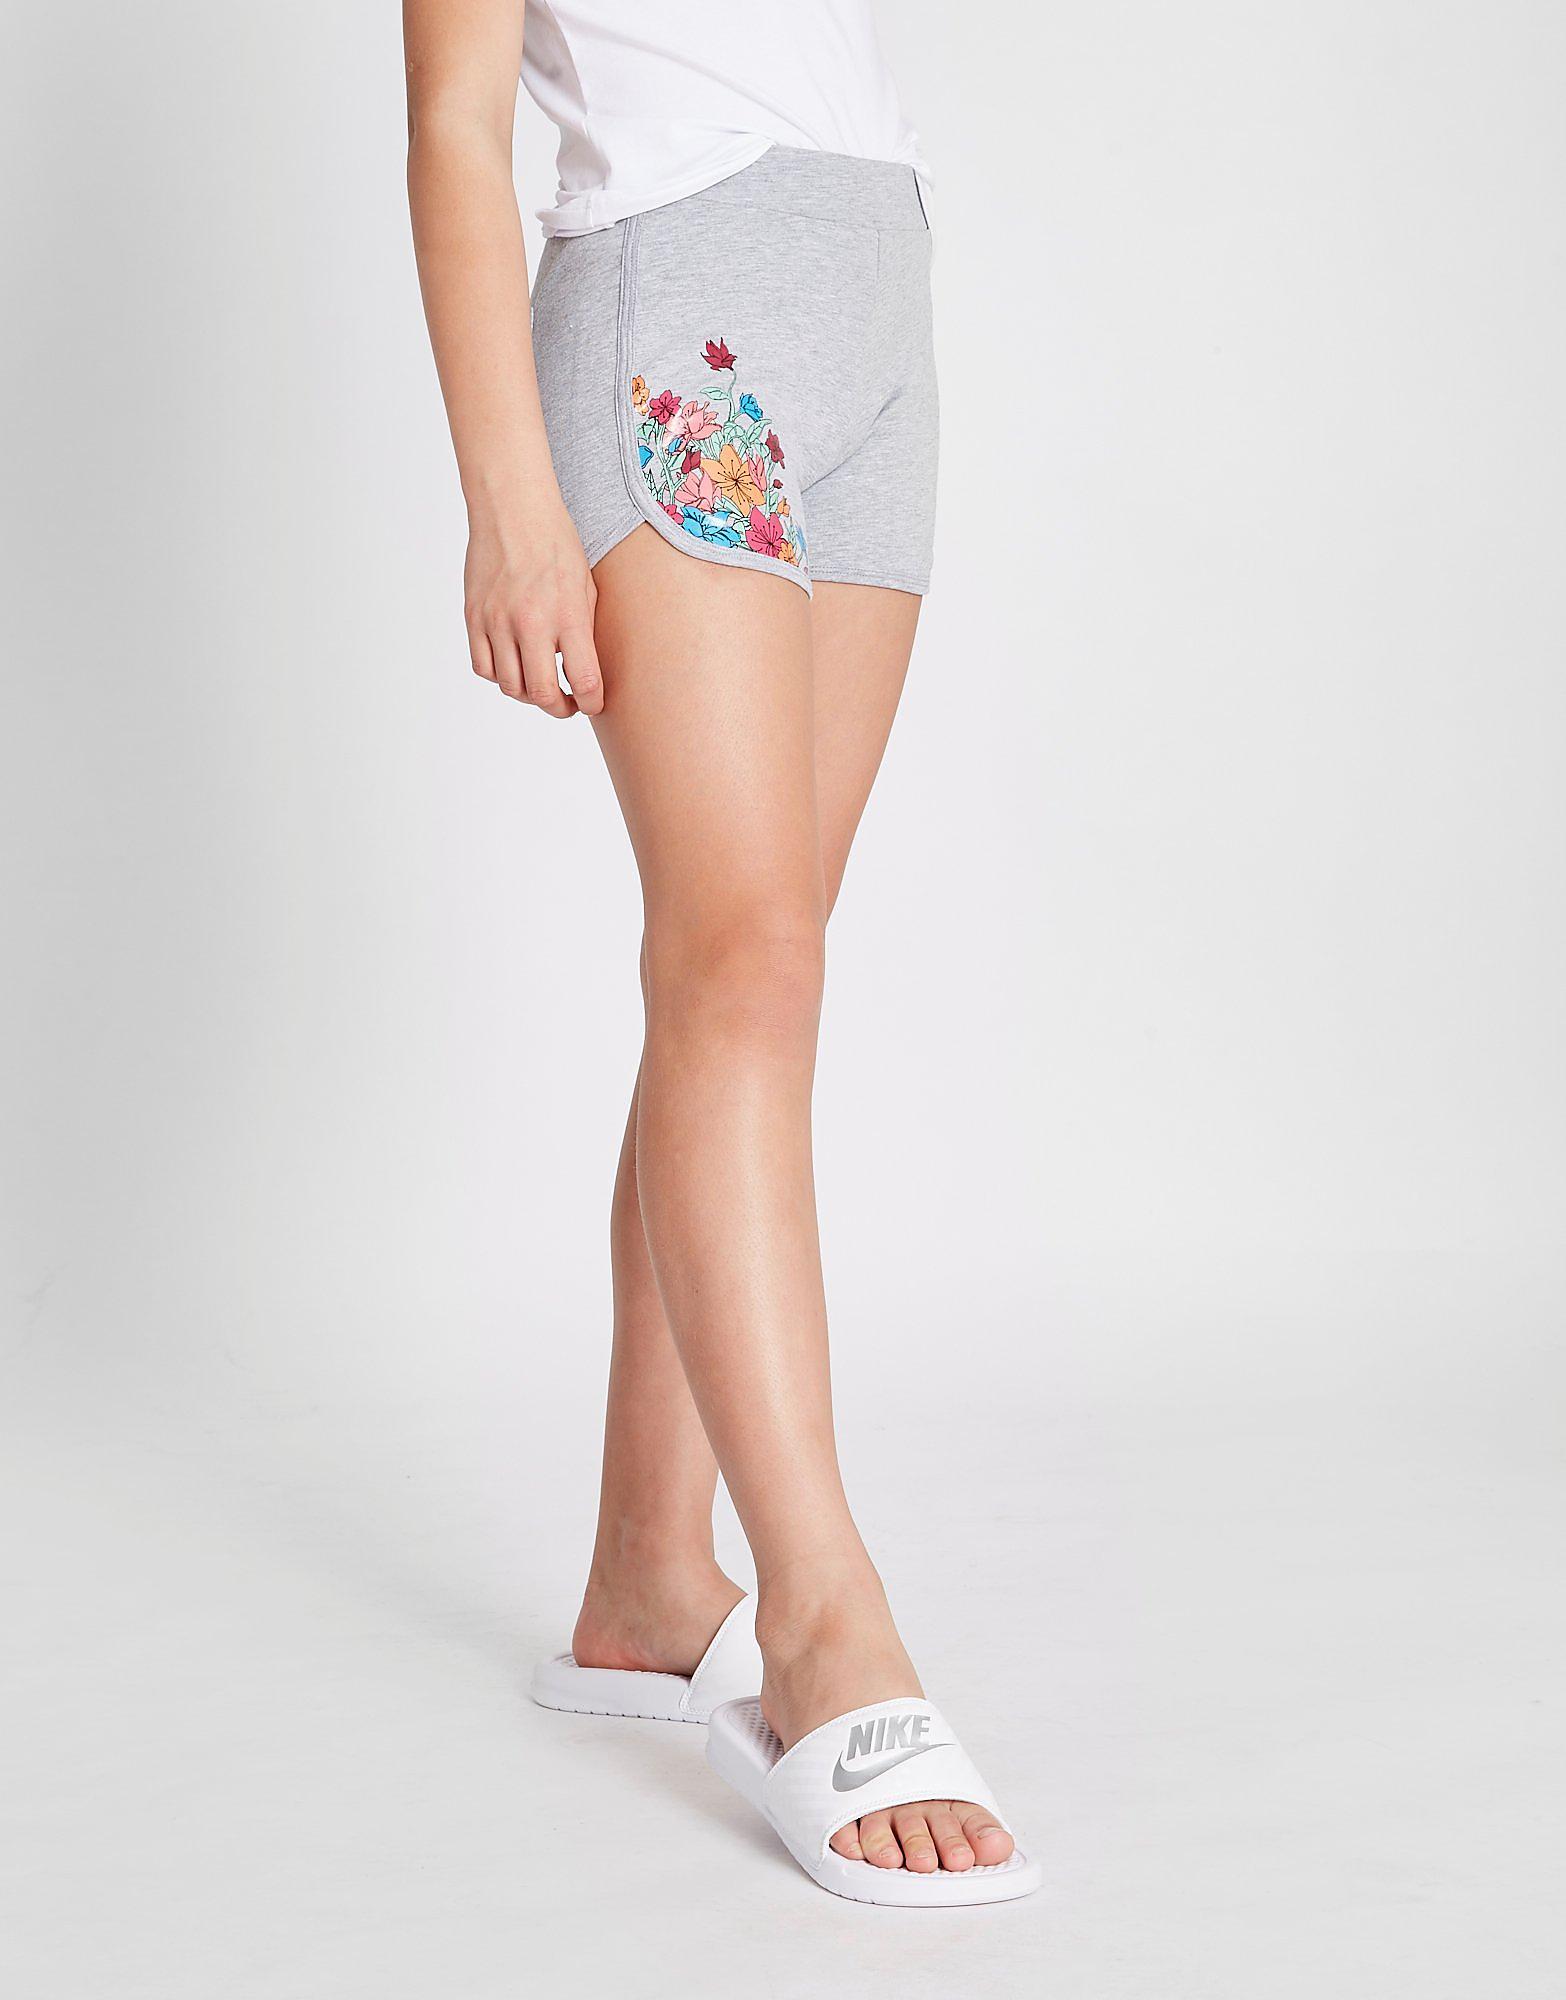 Emporio Armani EA7 Girls' Floral Fleece Shorts Junior